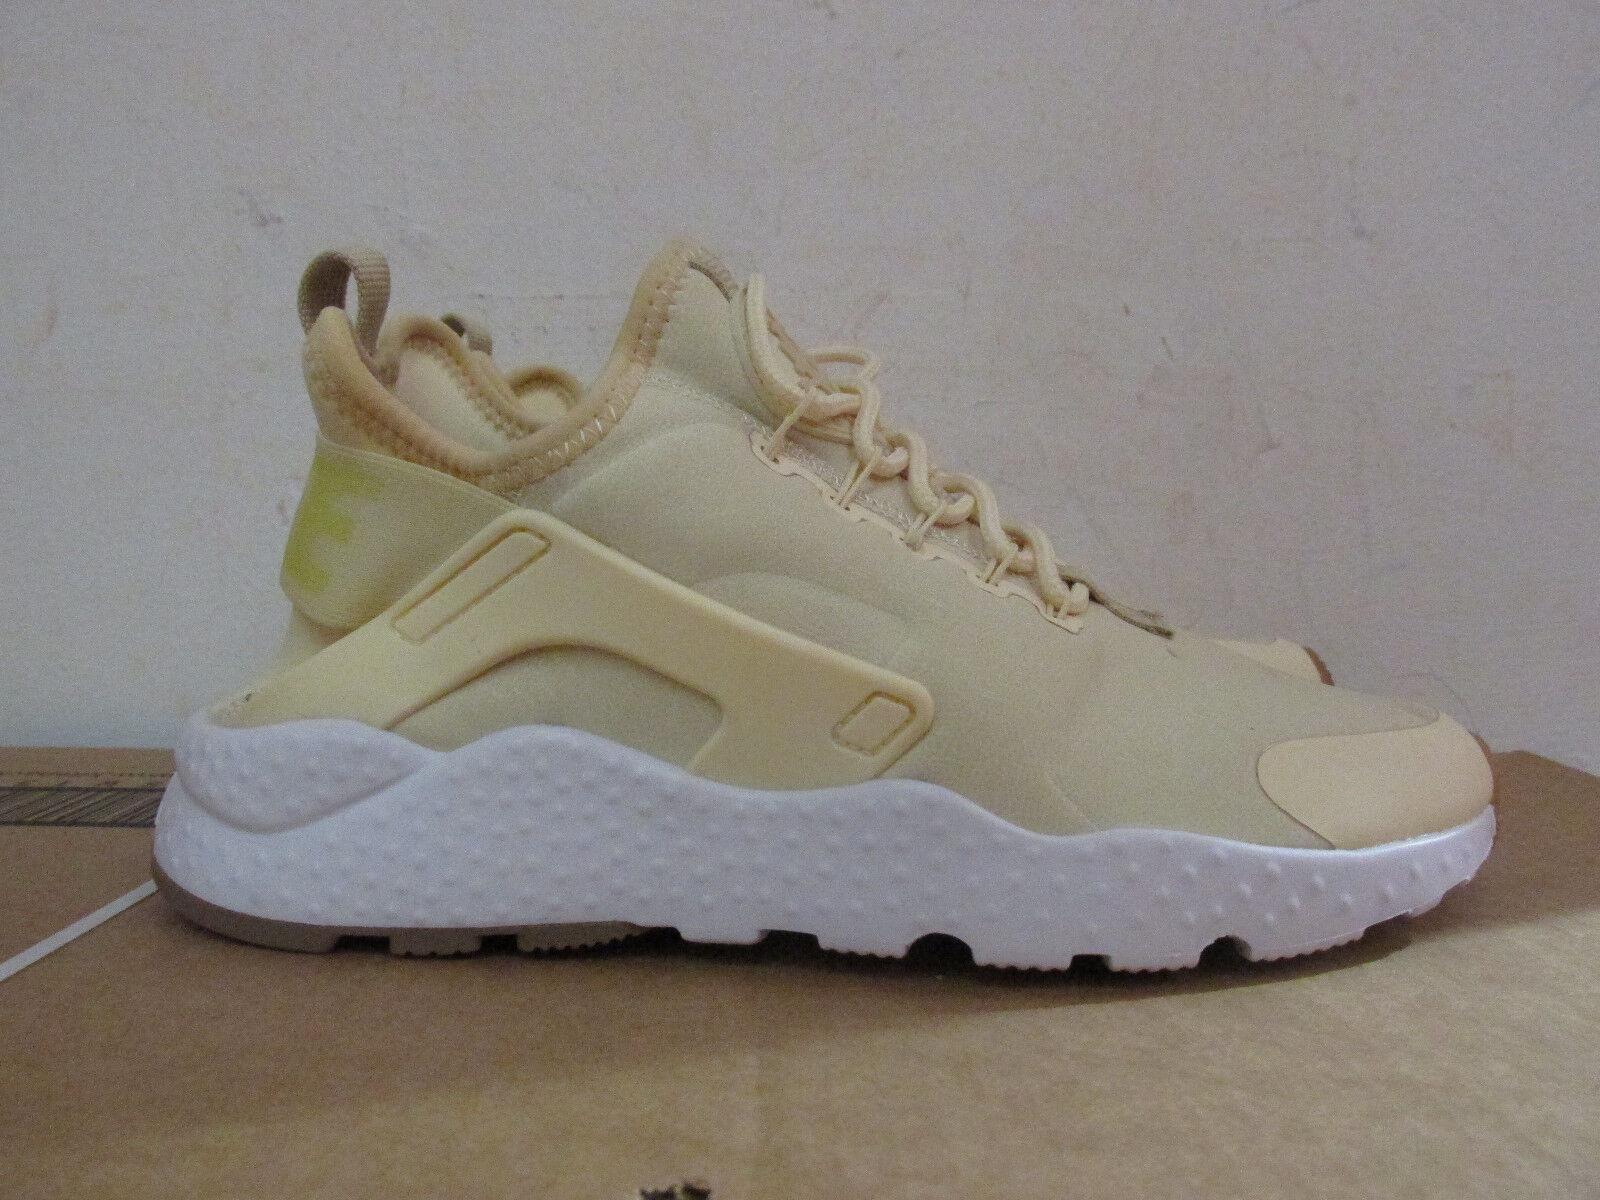 Nike Luft Huarache Ultra Damen 859511 101 Turnschuhe Turnschuhe Schuhe Probe